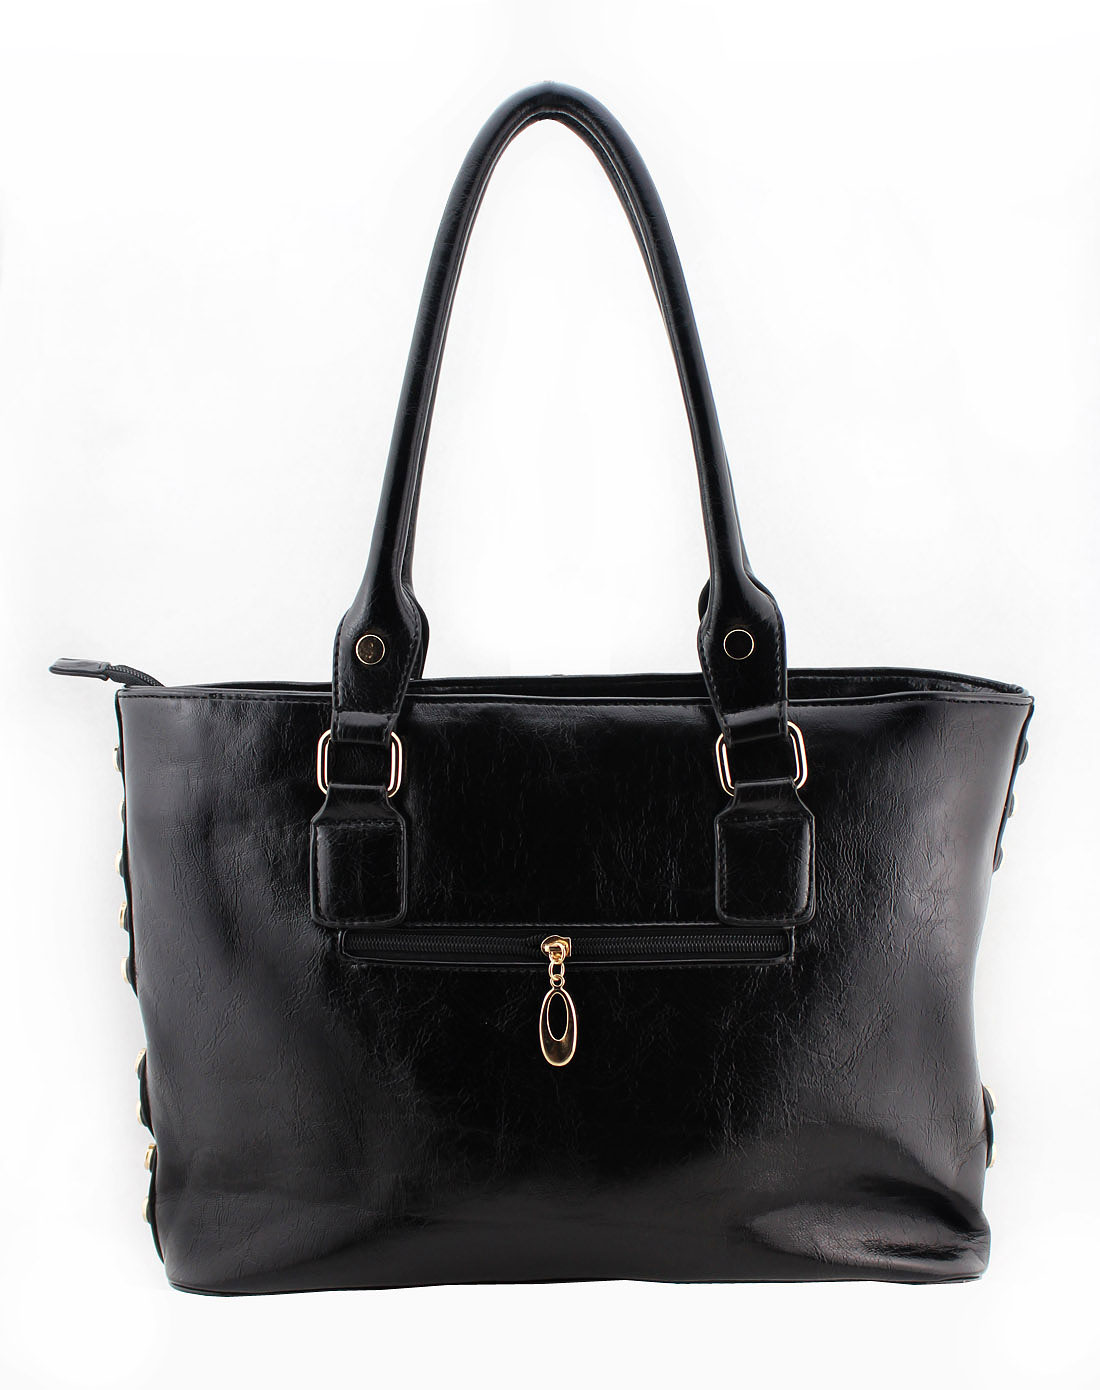 fields女式黑色新款手提包yscq